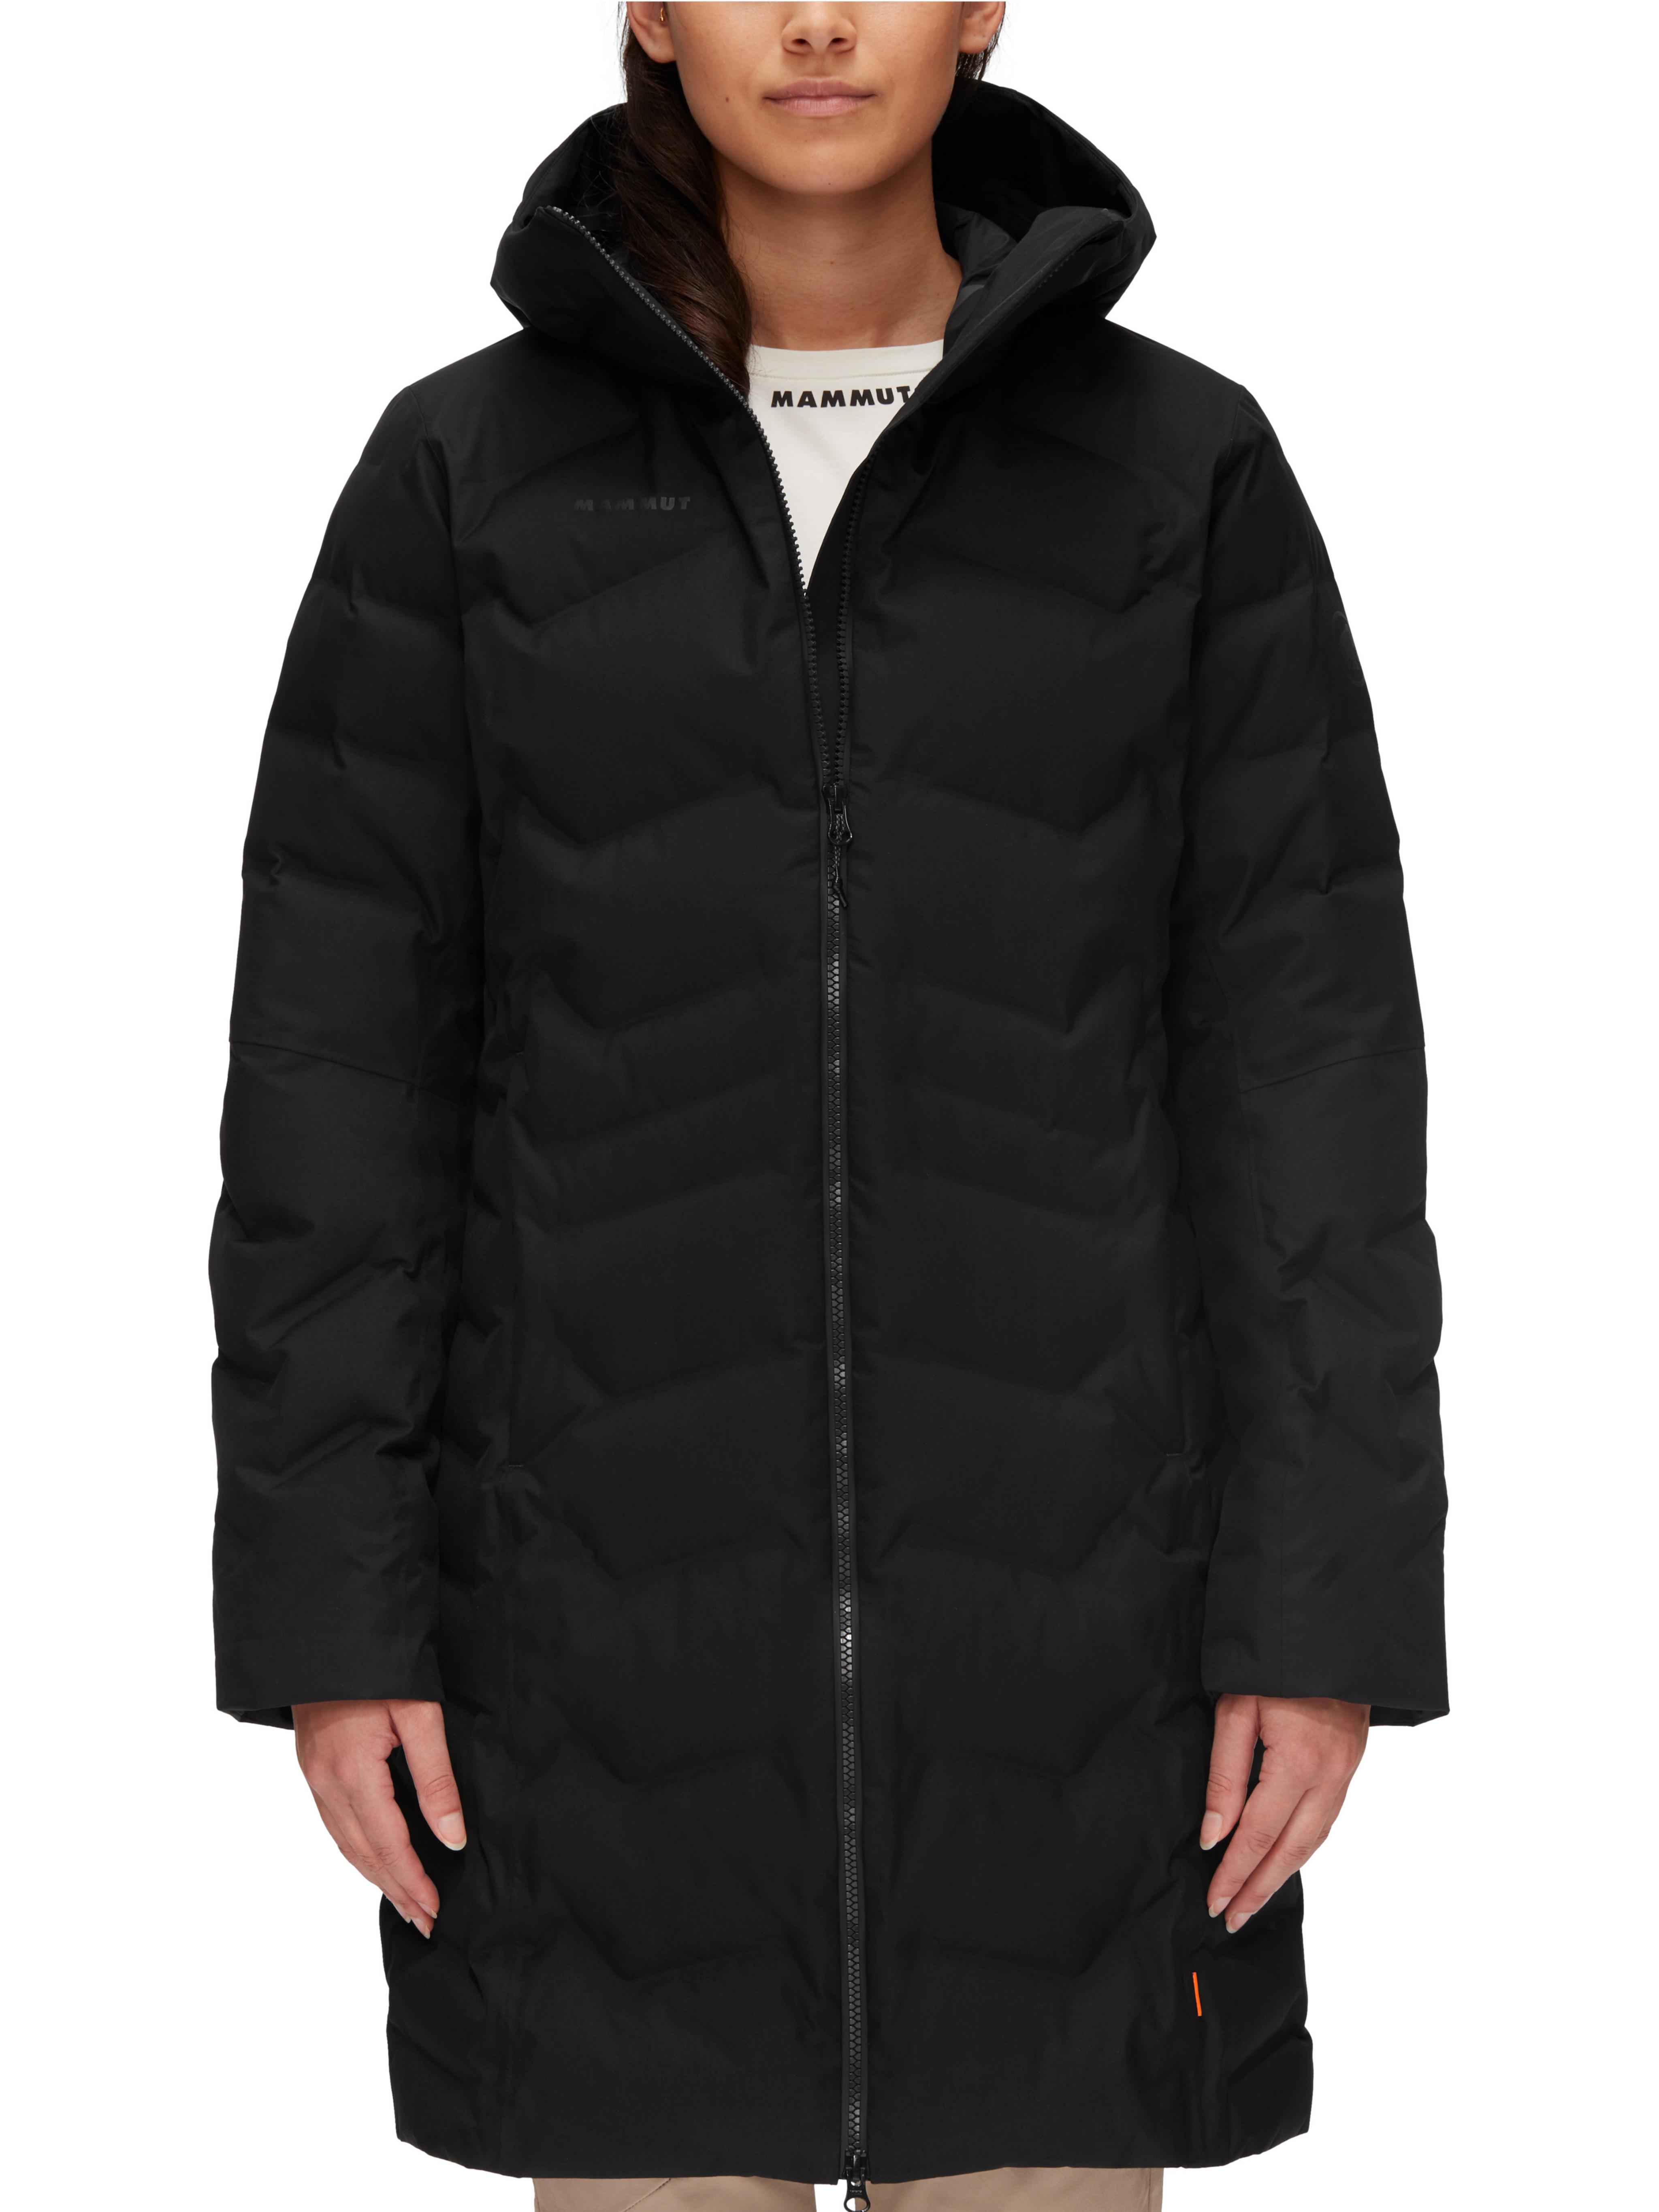 Photics HS Thermo Coat Women product image